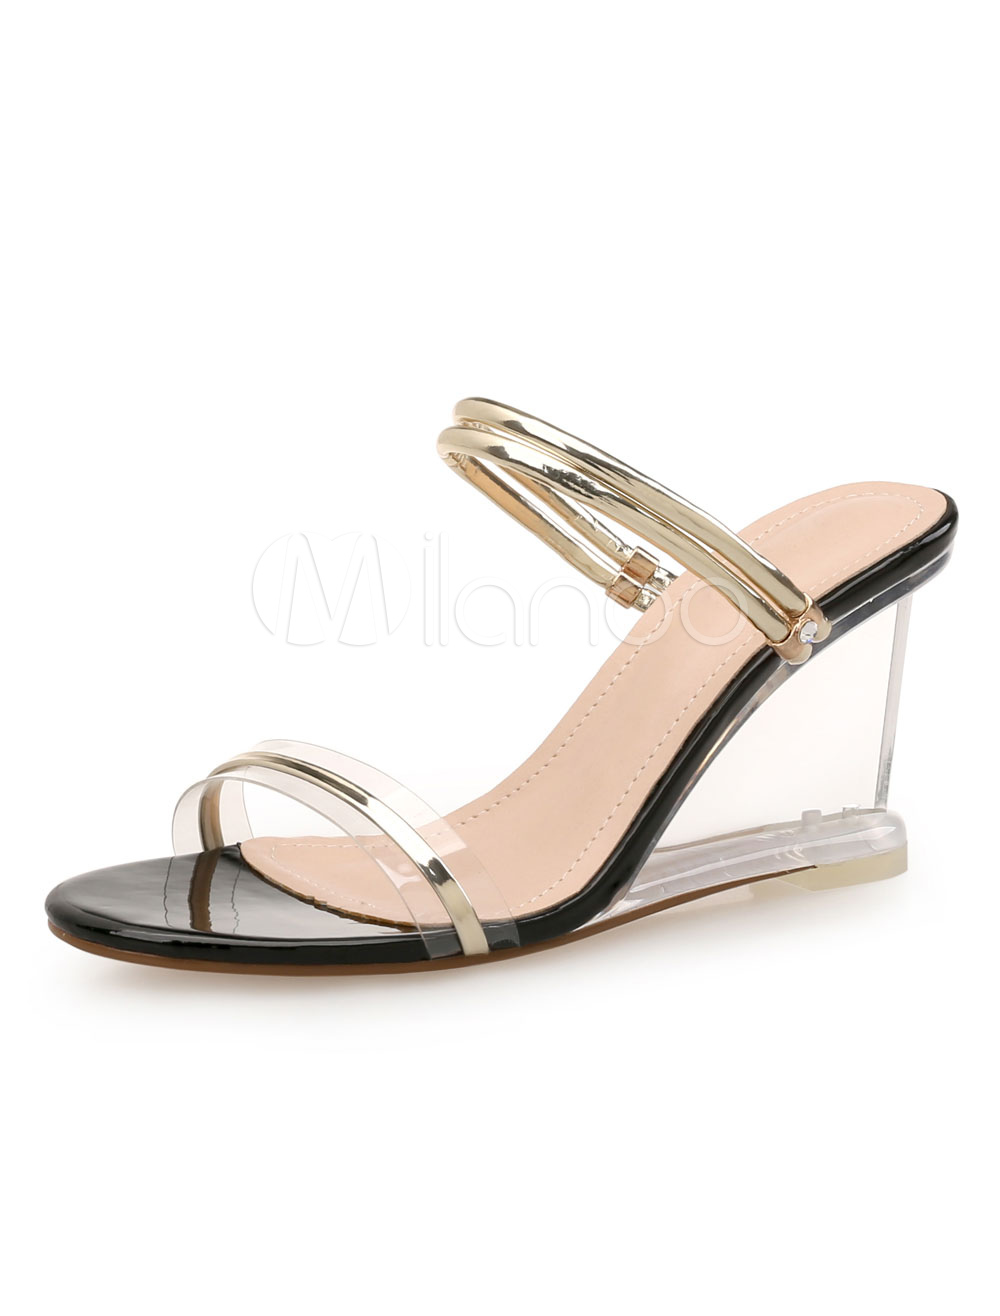 cc4a73393f42 ... Gold Wedge Sandals Women Shoes Open Toe Slide Sandals-No.6. 12. 50%OFF.  Color Blond